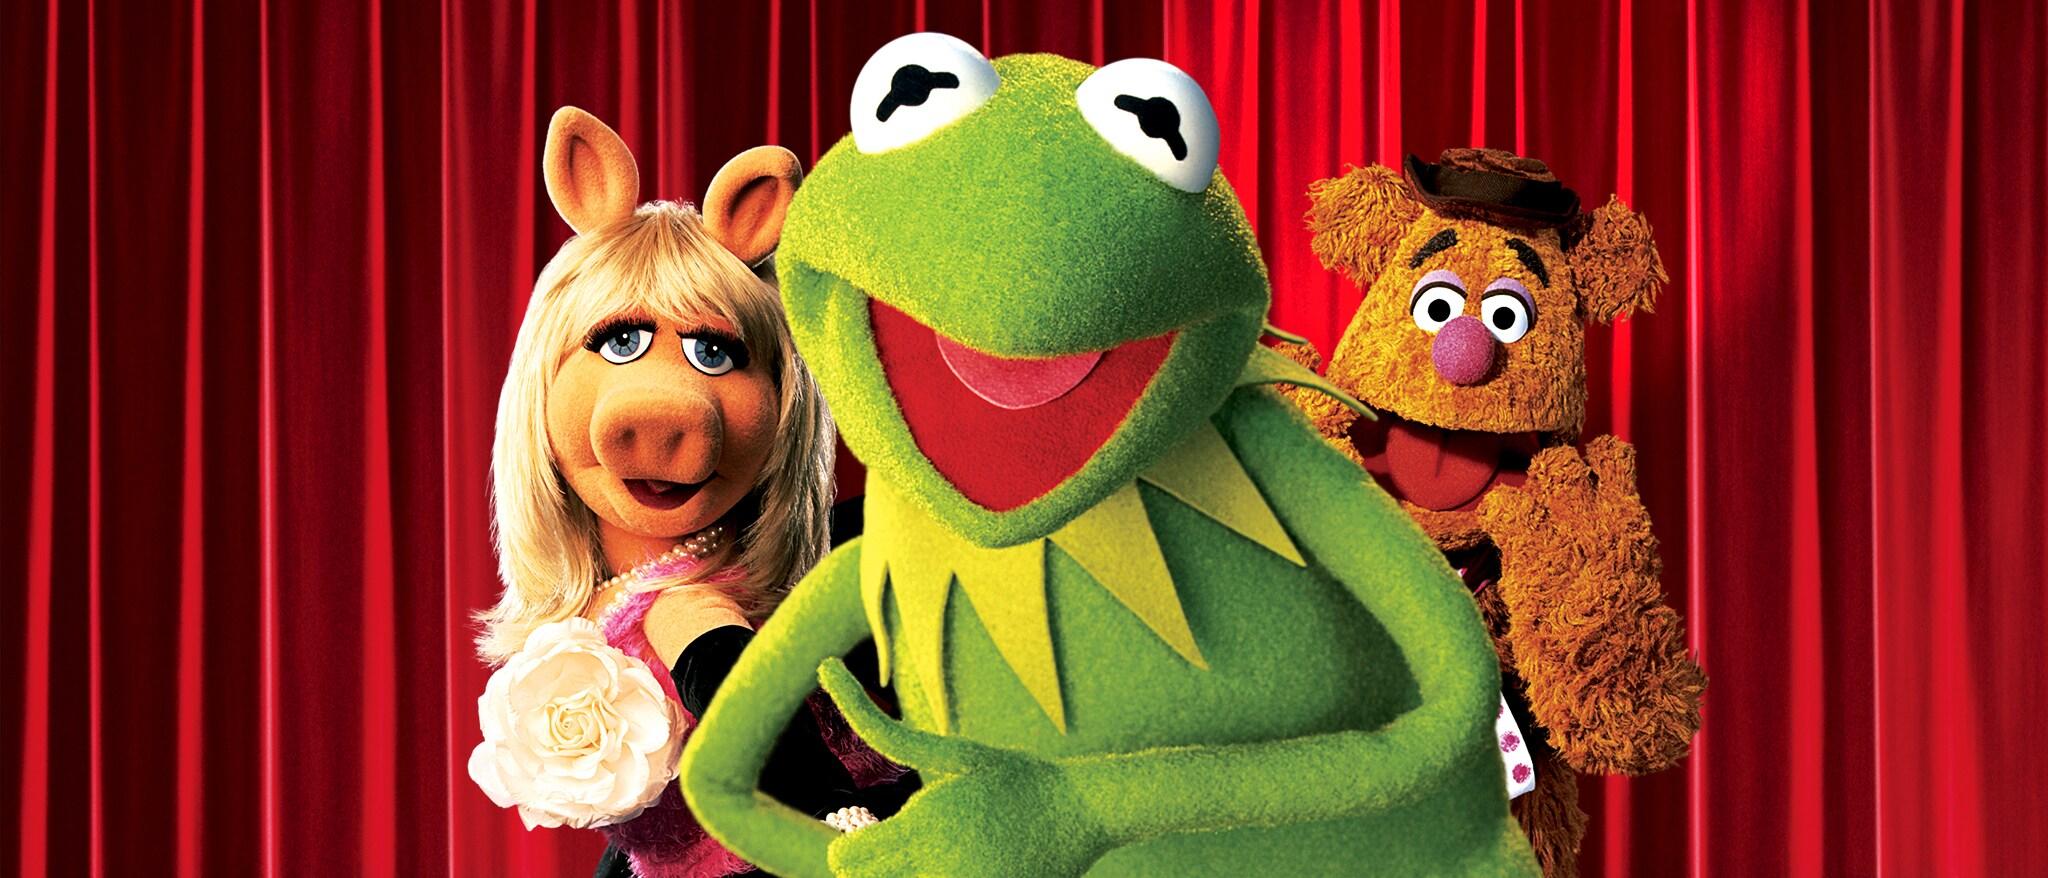 The Muppet Show hero